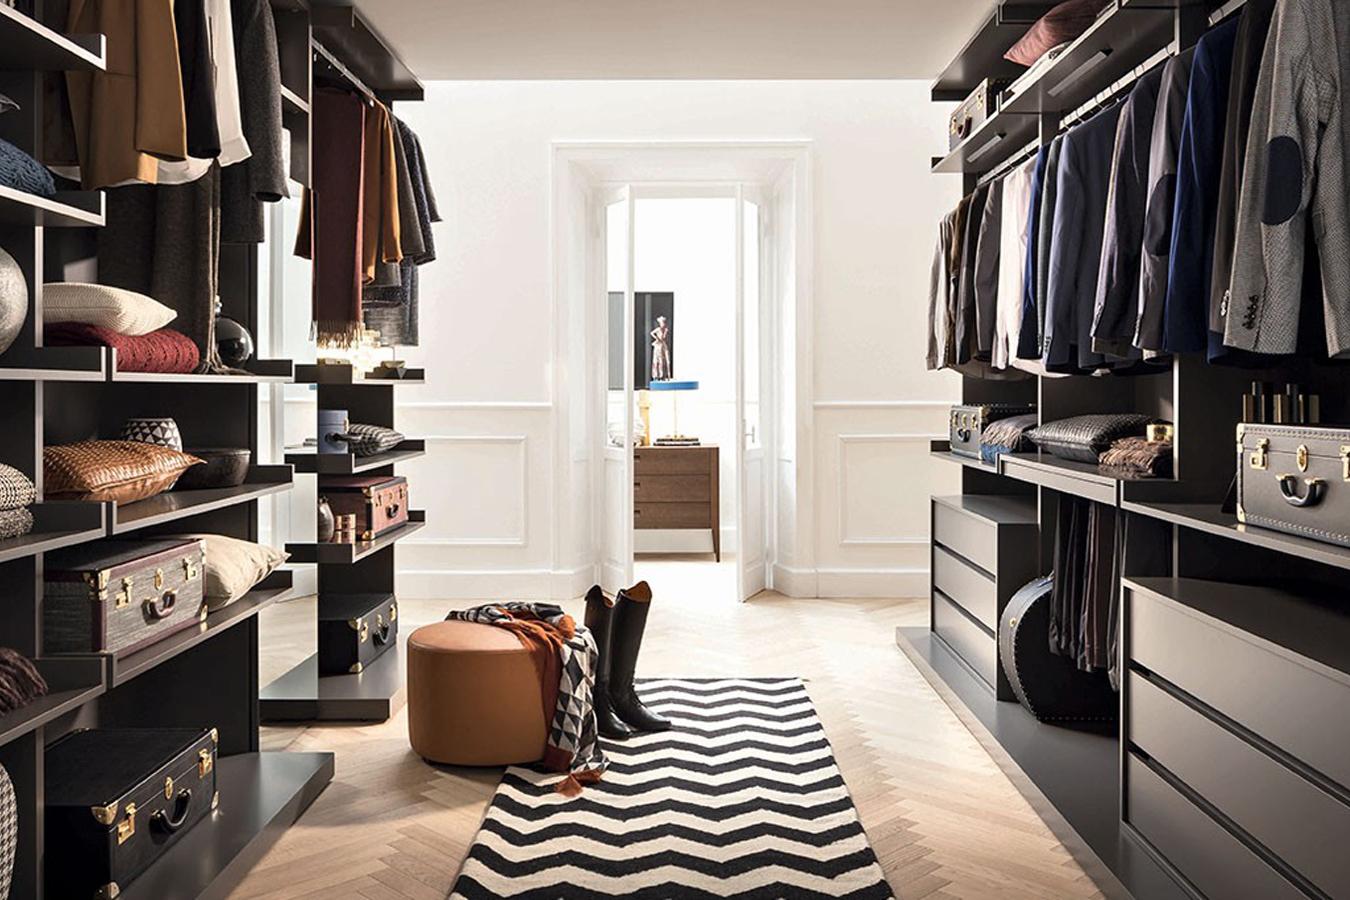 Нужна ли вентиляция в гардеробной